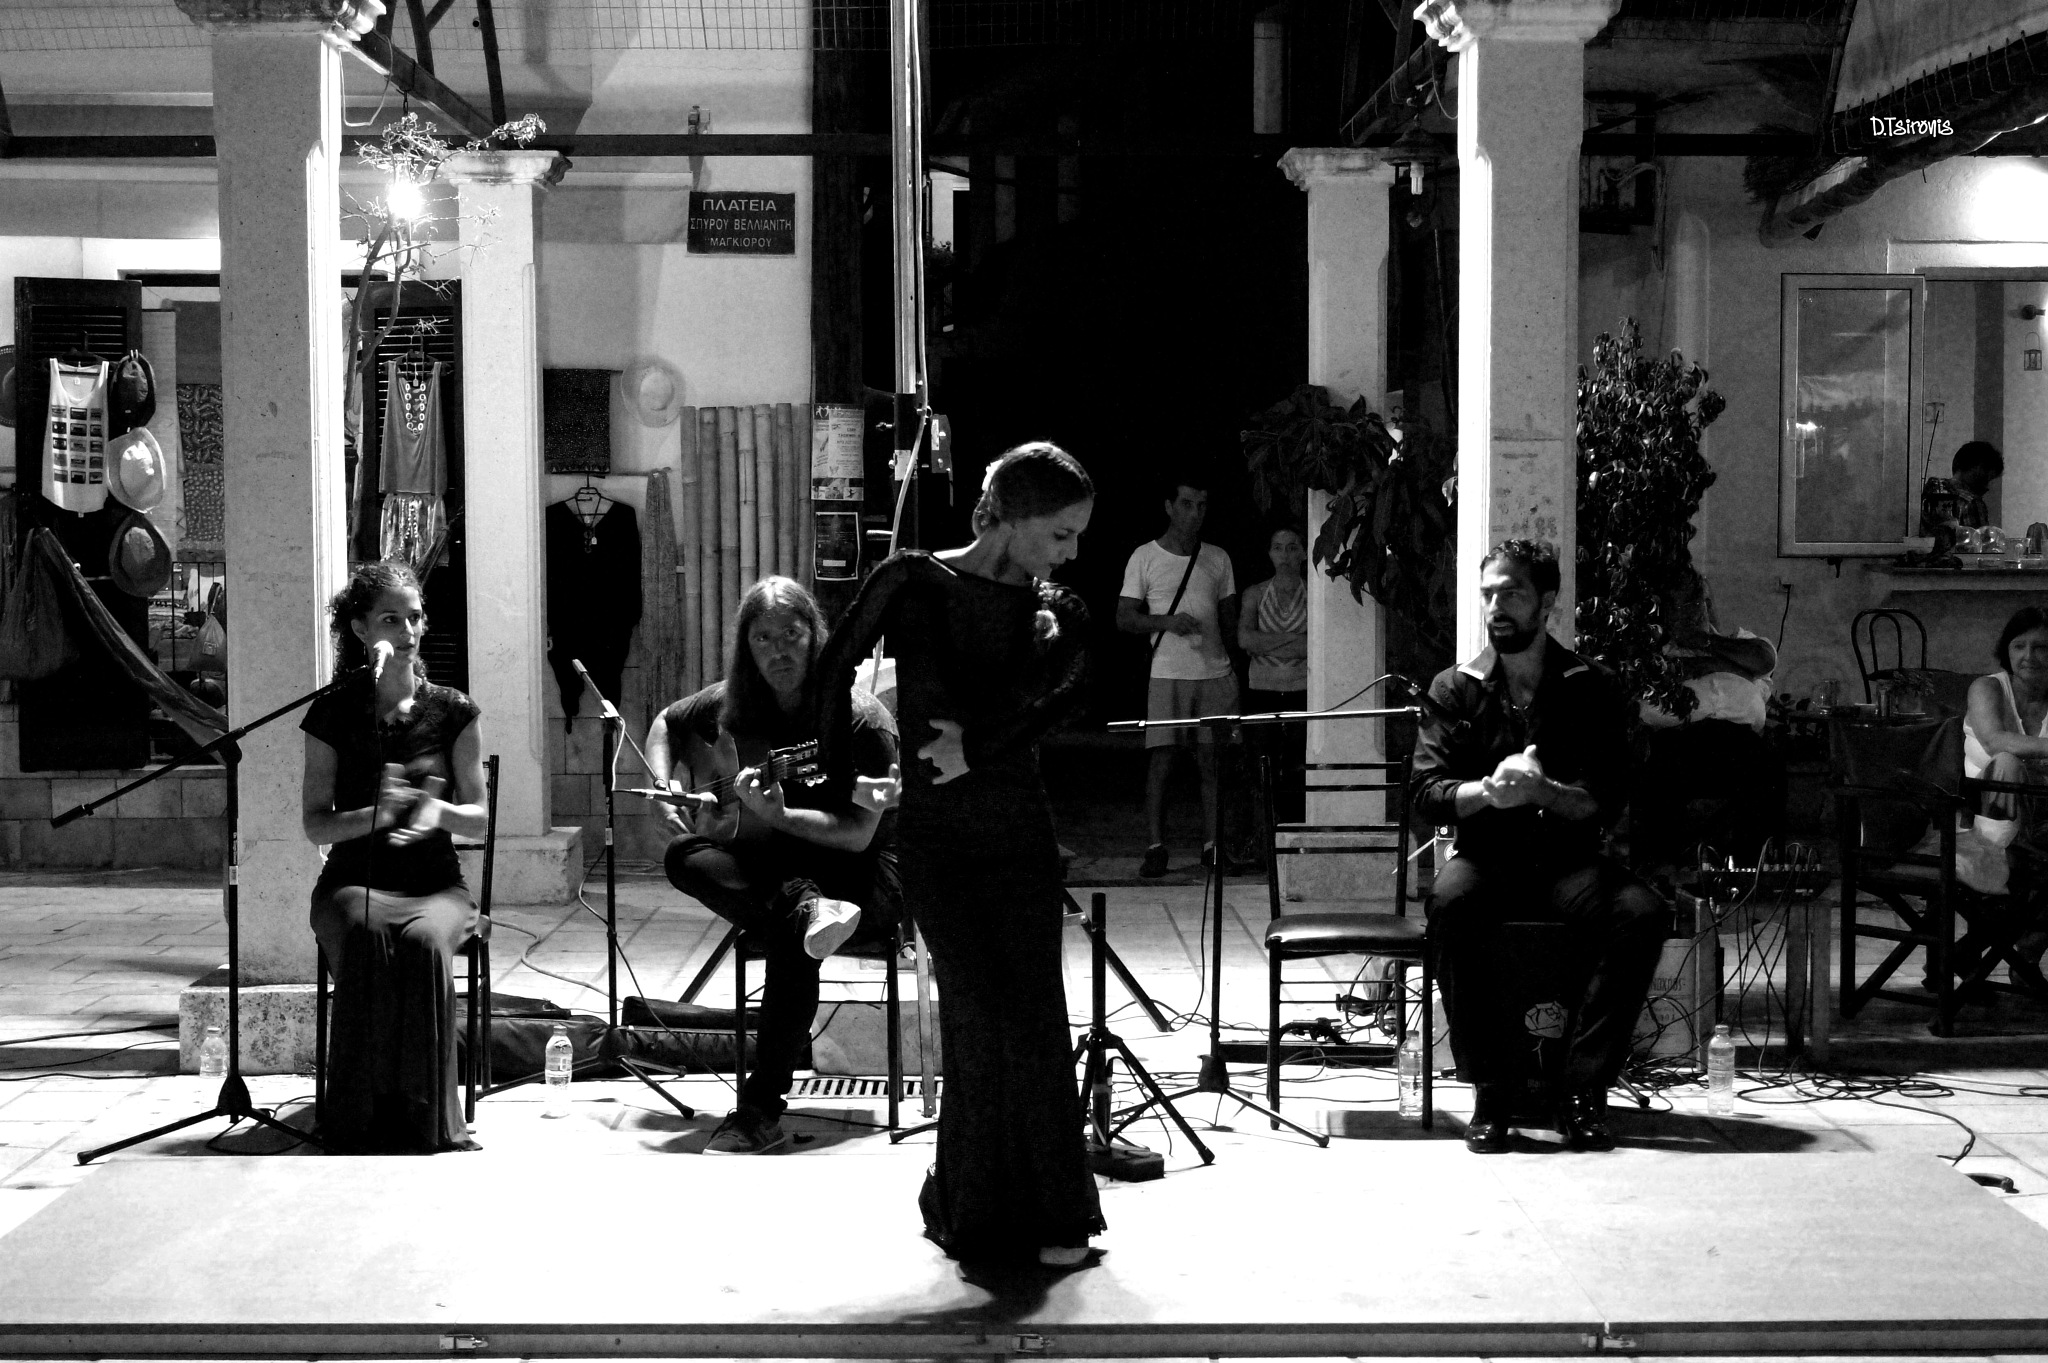 Flamenco by DimitrisTsironis